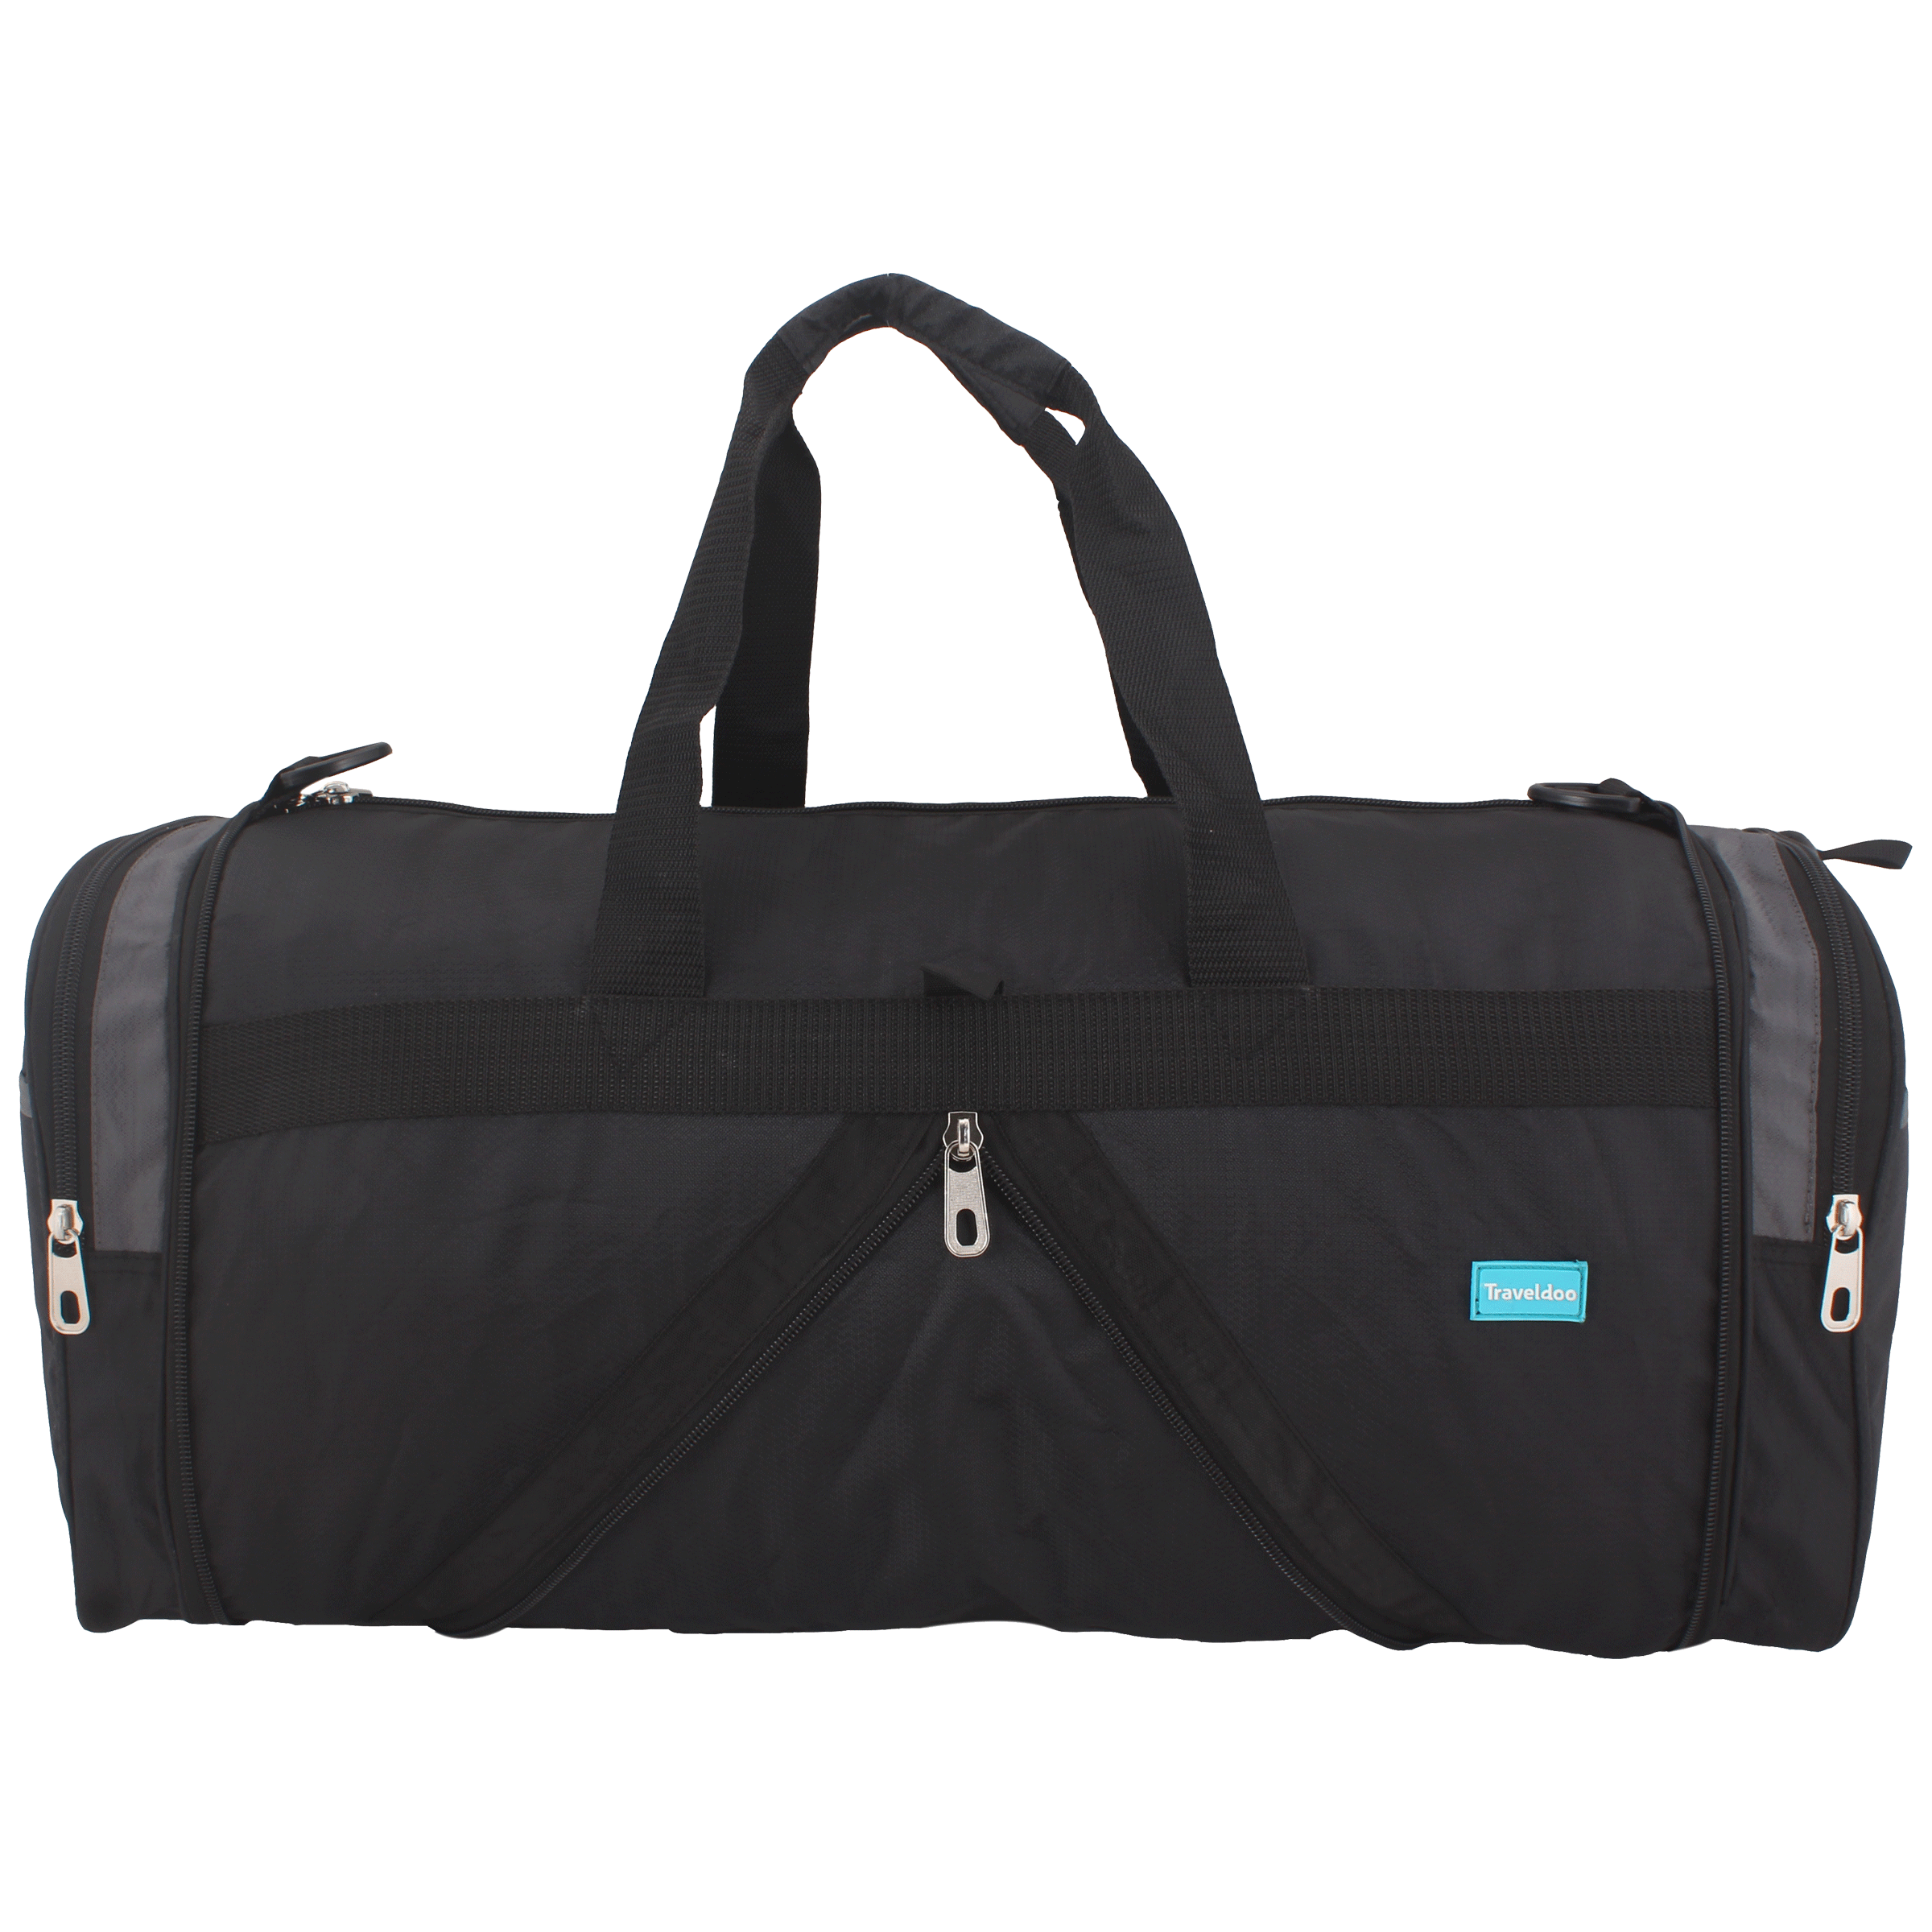 Traveldoo 18 inch Square Folding Duffle Bag (DBS01003, Grey)_1